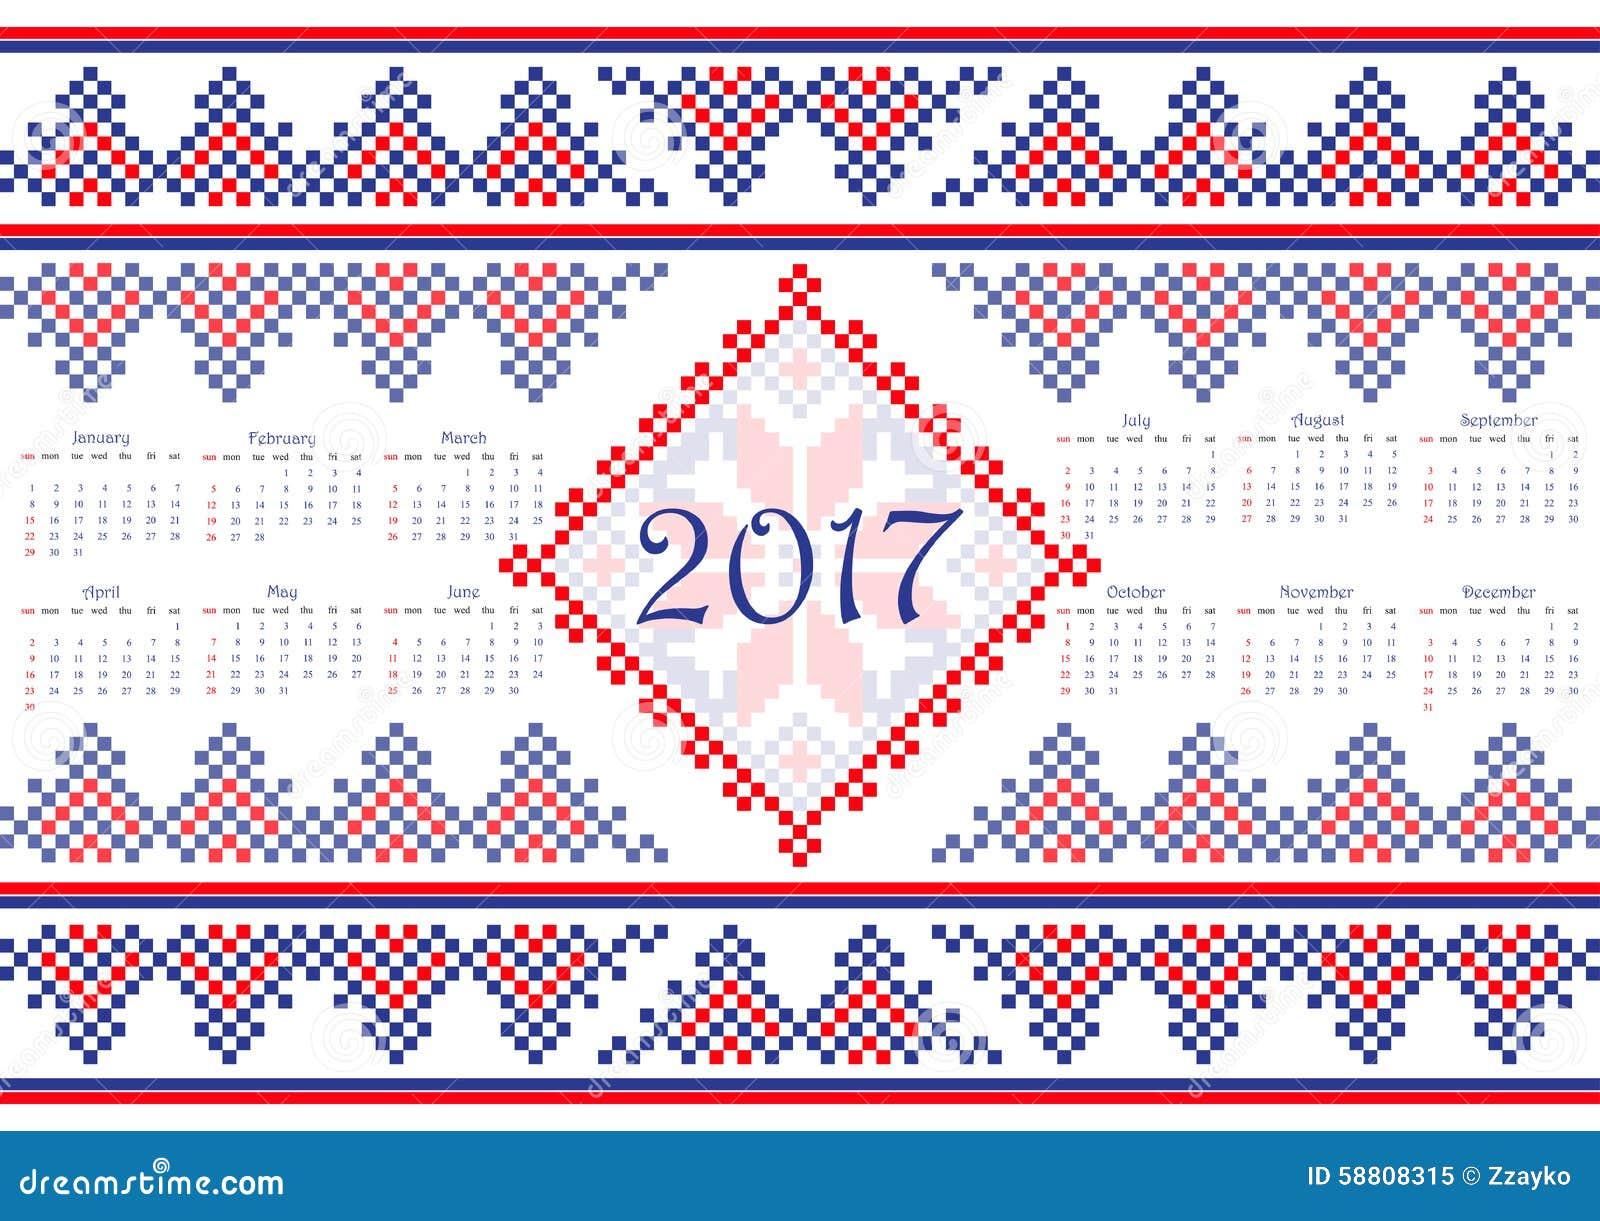 Лунные календарь самара 2016